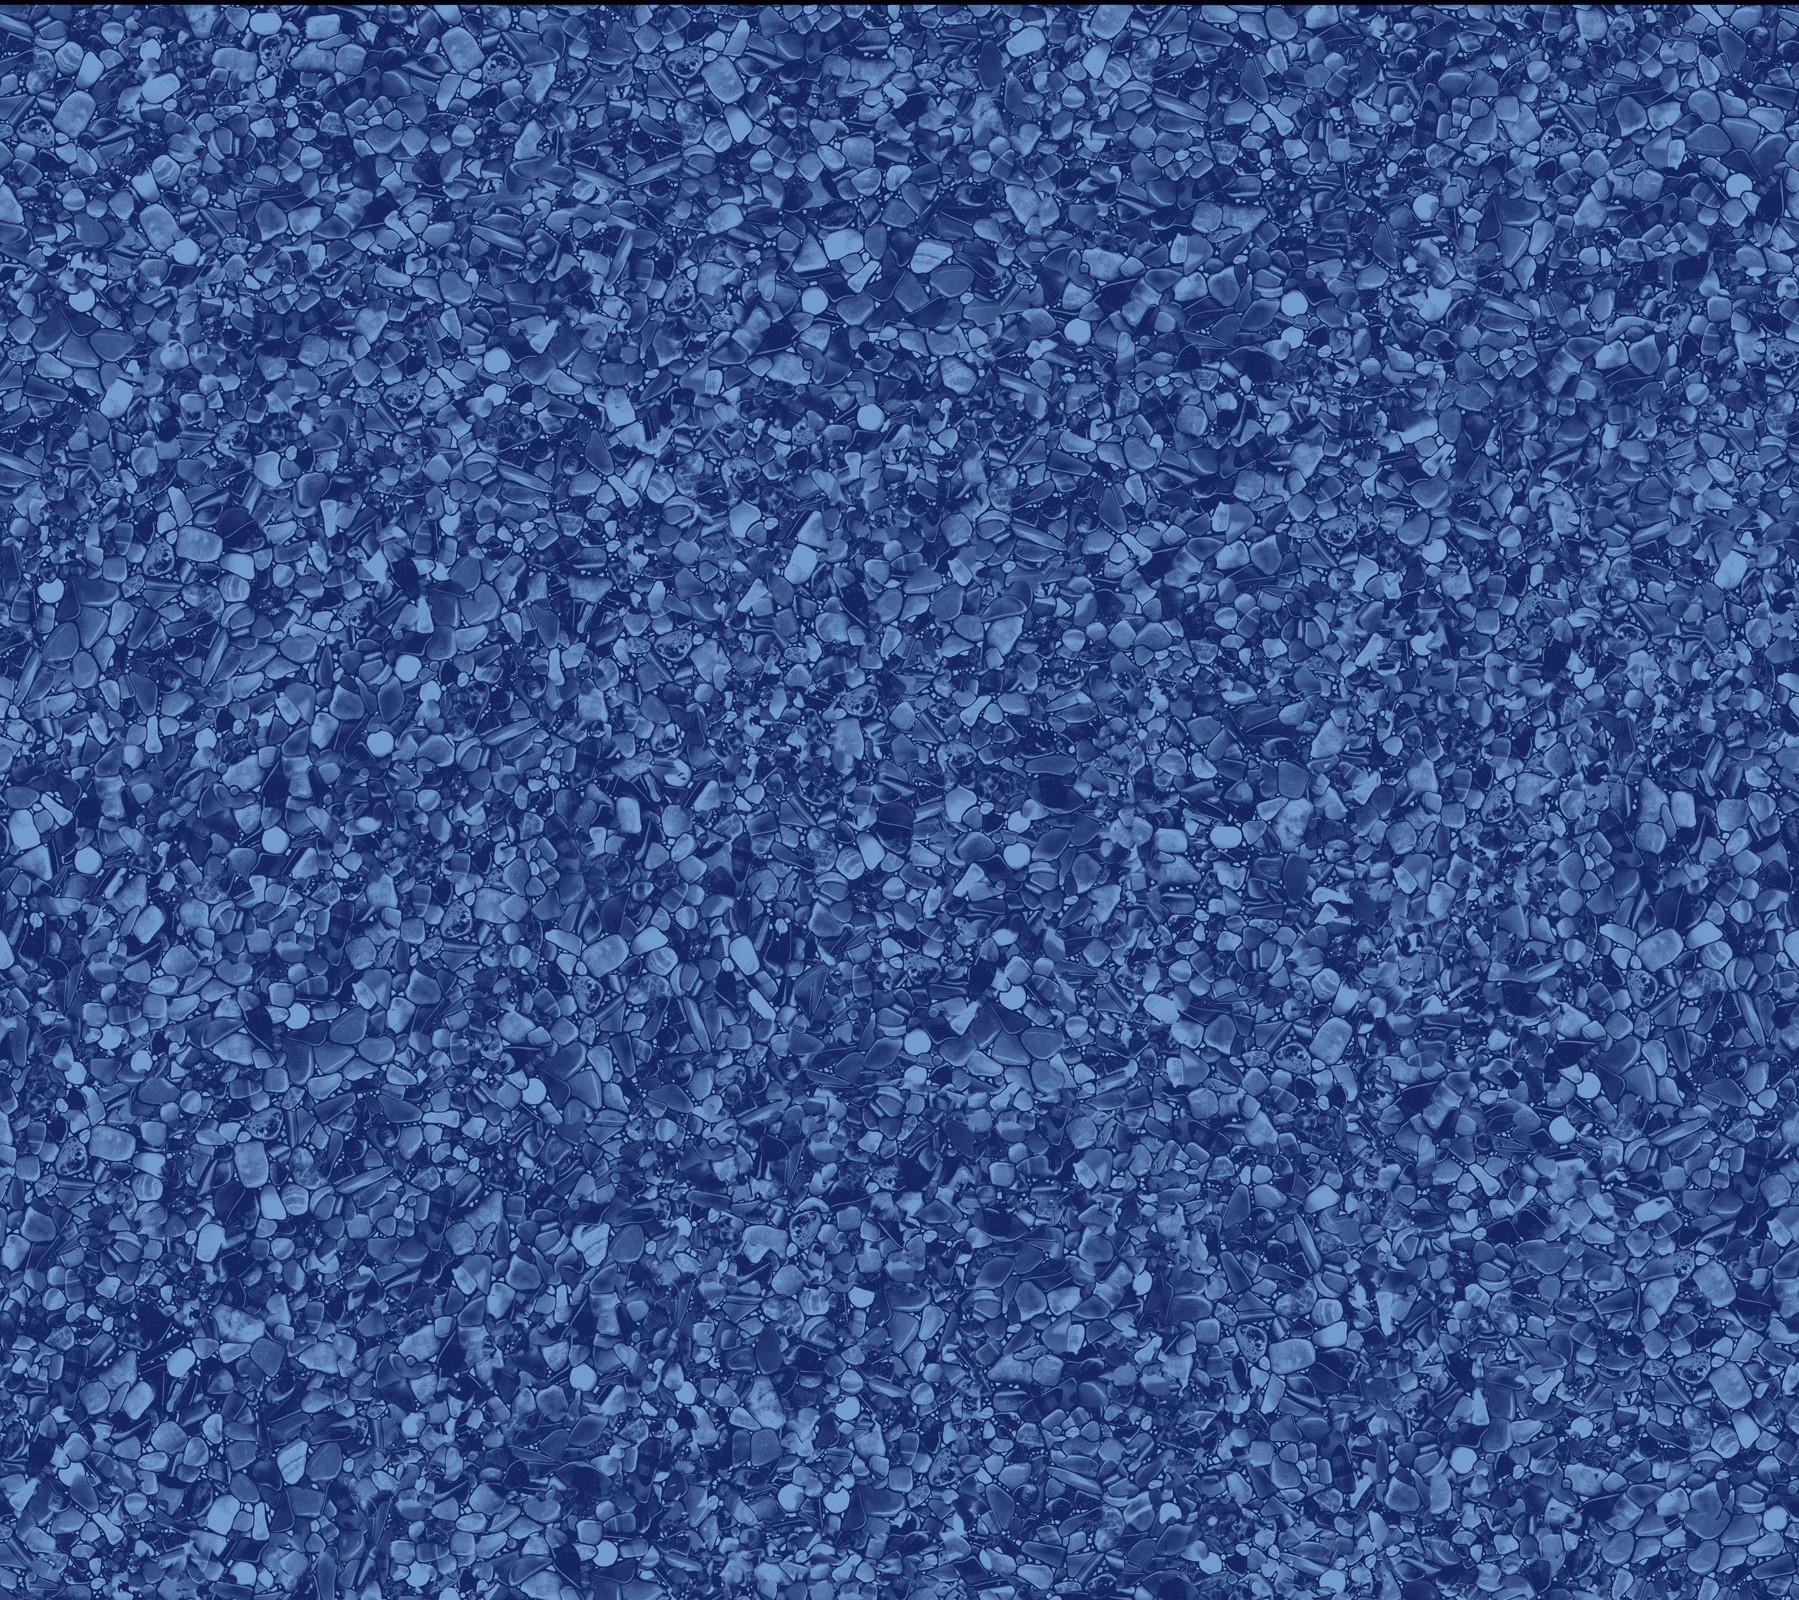 Blue Beach Pebble